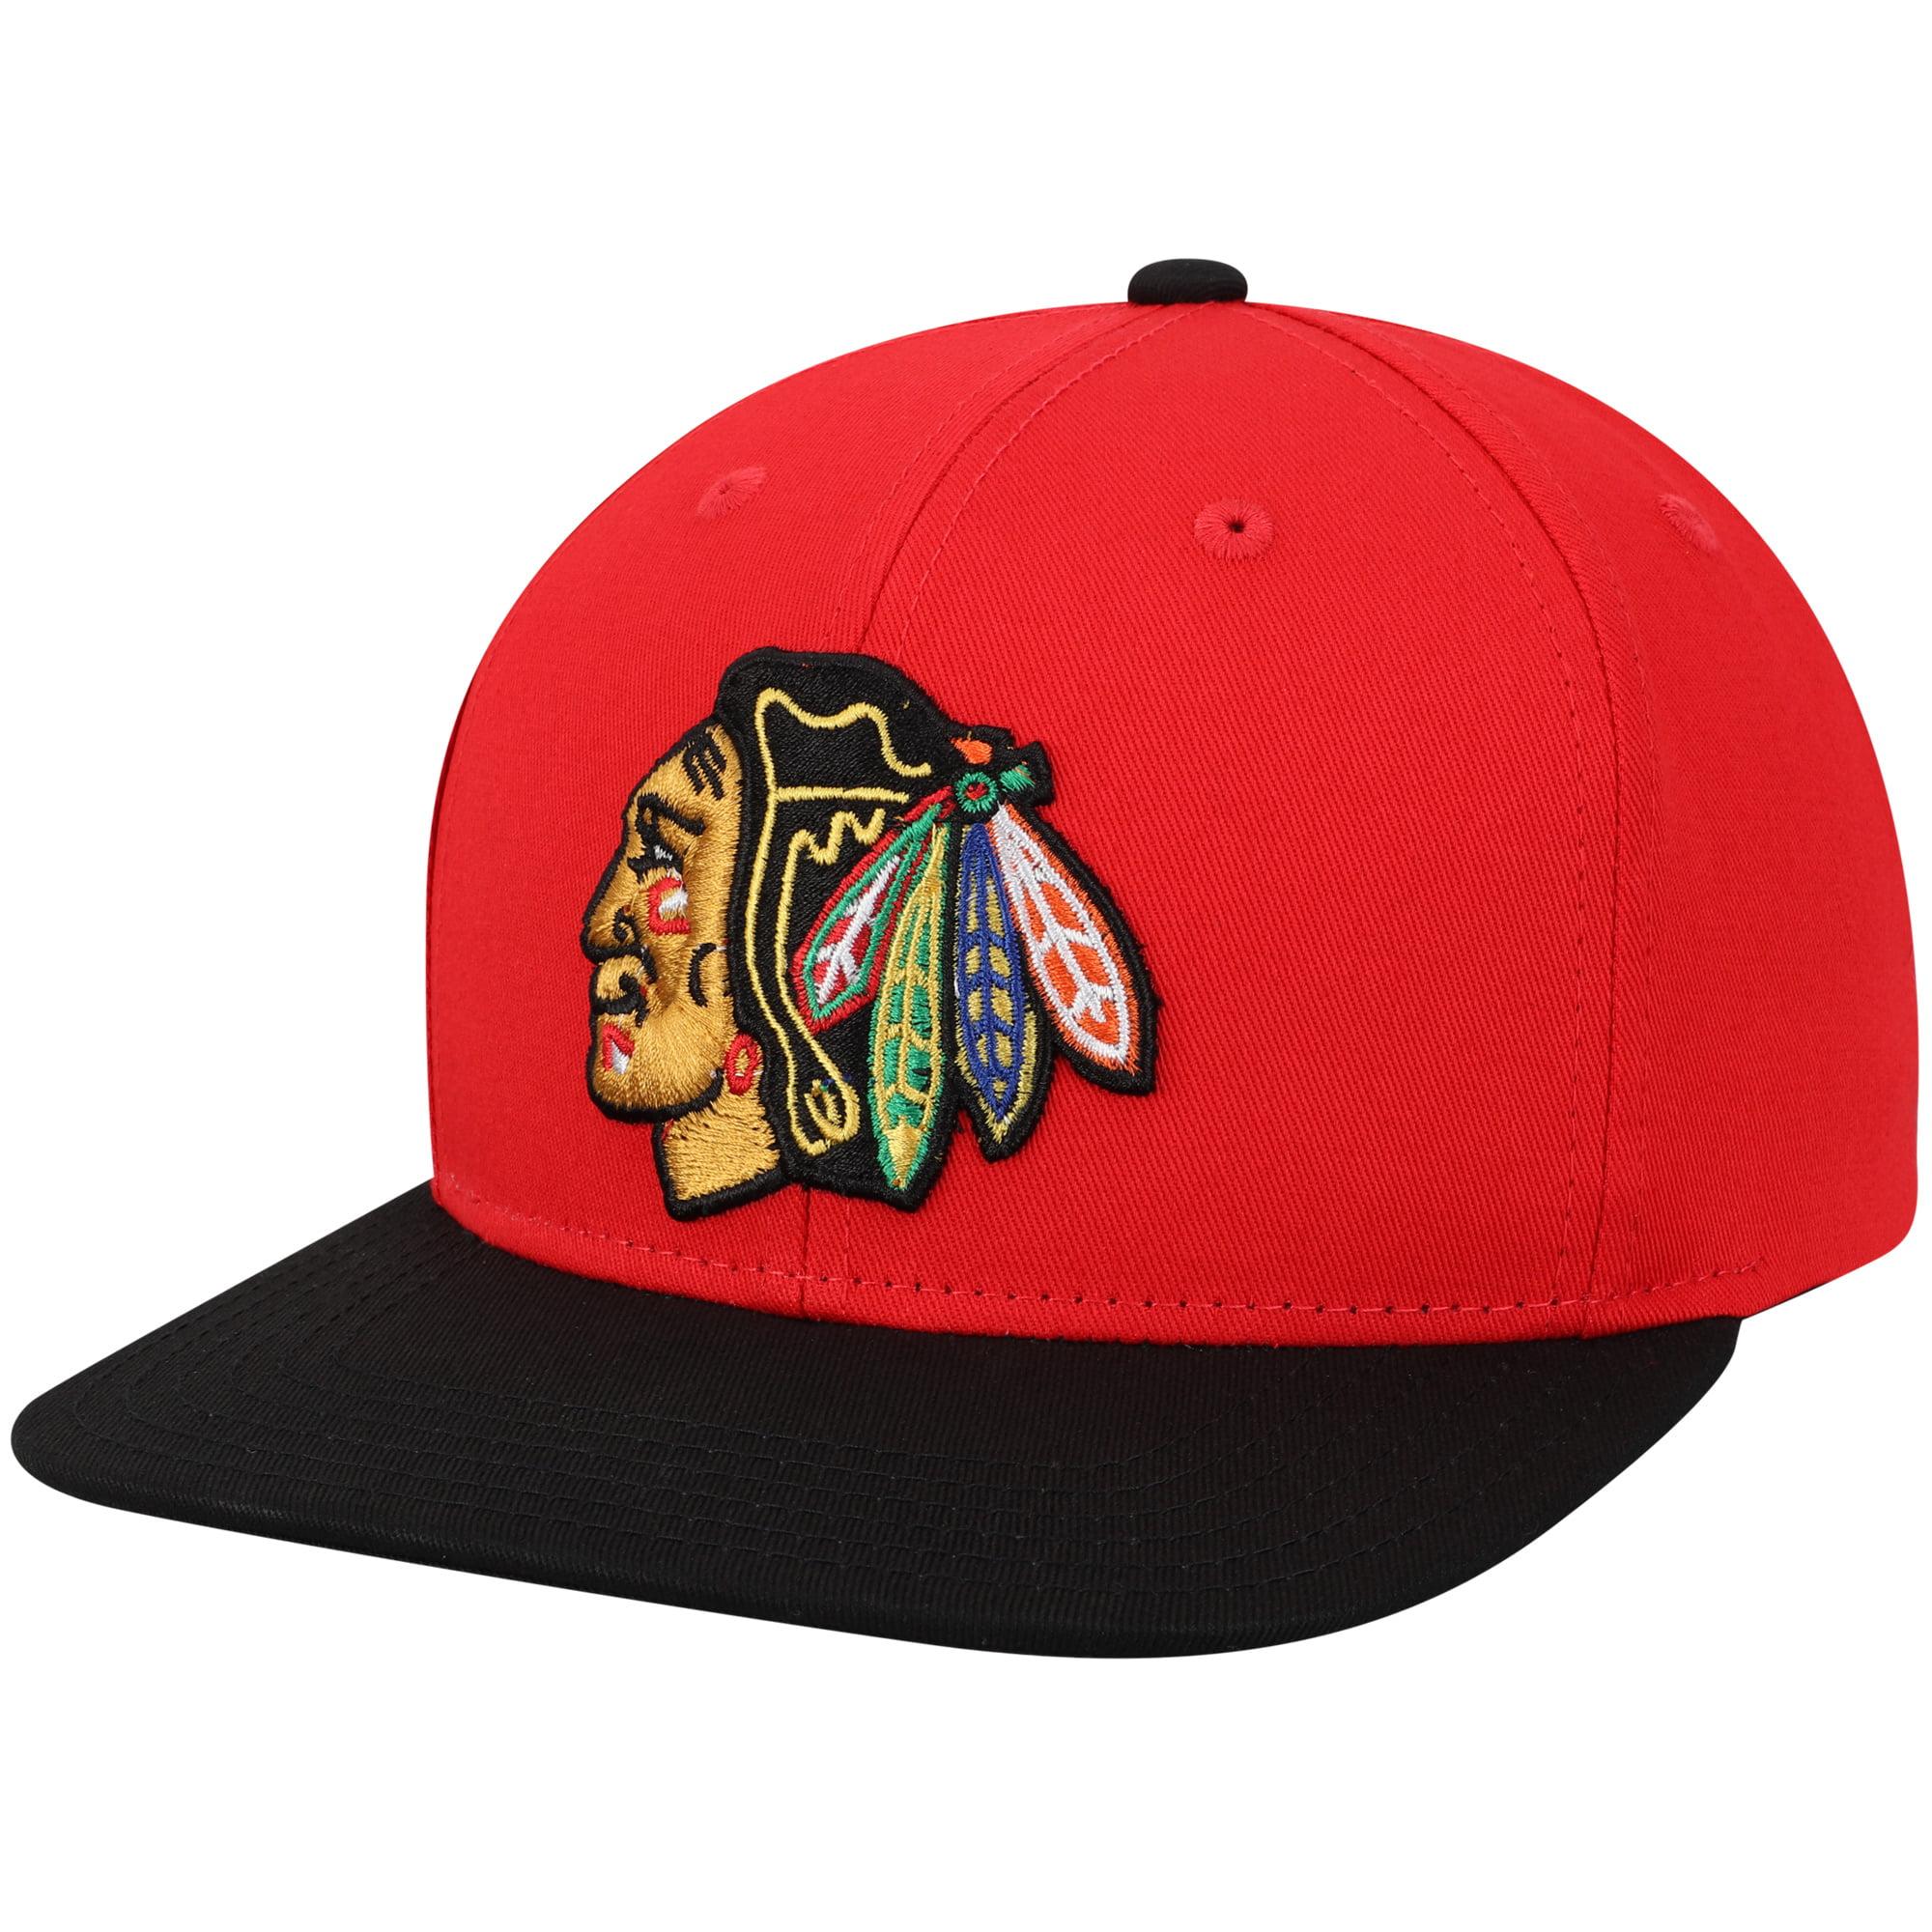 Chicago Blackhawks Youth Two-Tone Flatbrim Snapback Adjustable Hat - Red/Black - OSFA